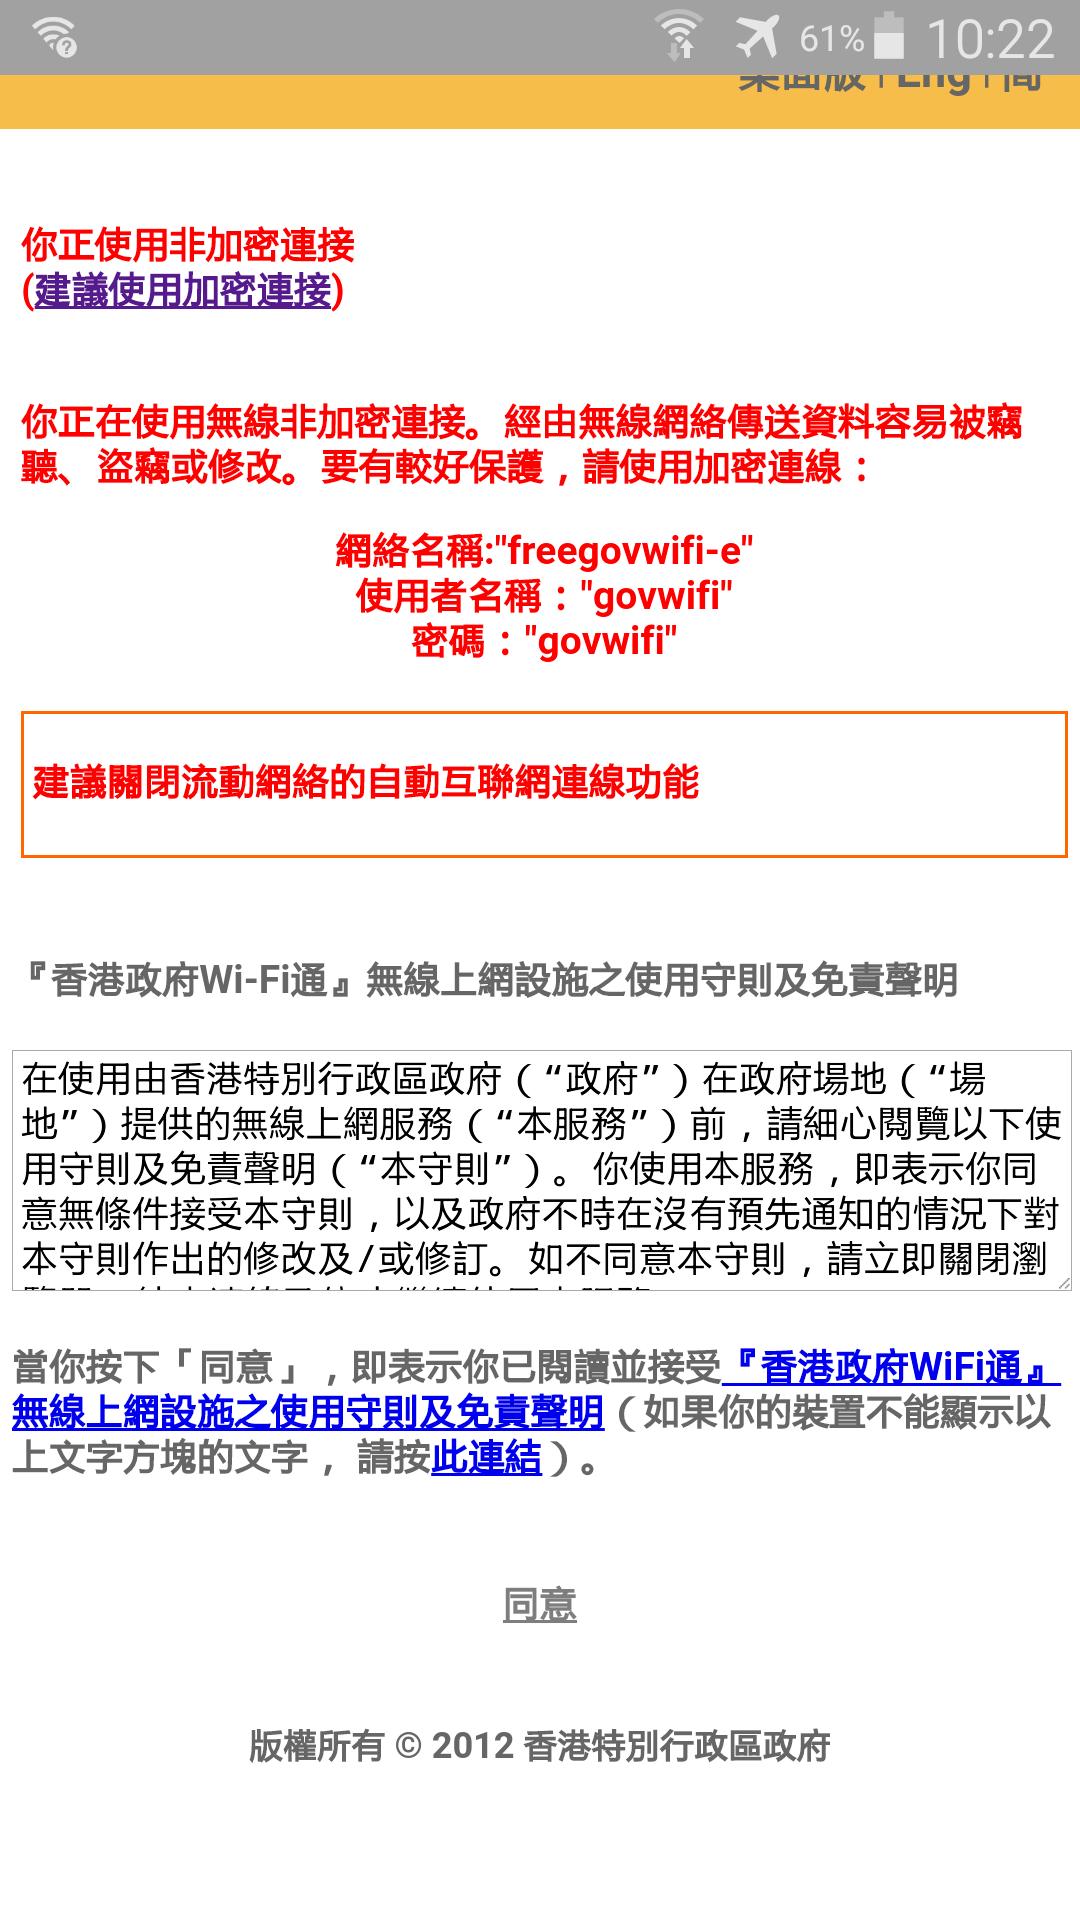 香港政府WiFi通 04.png